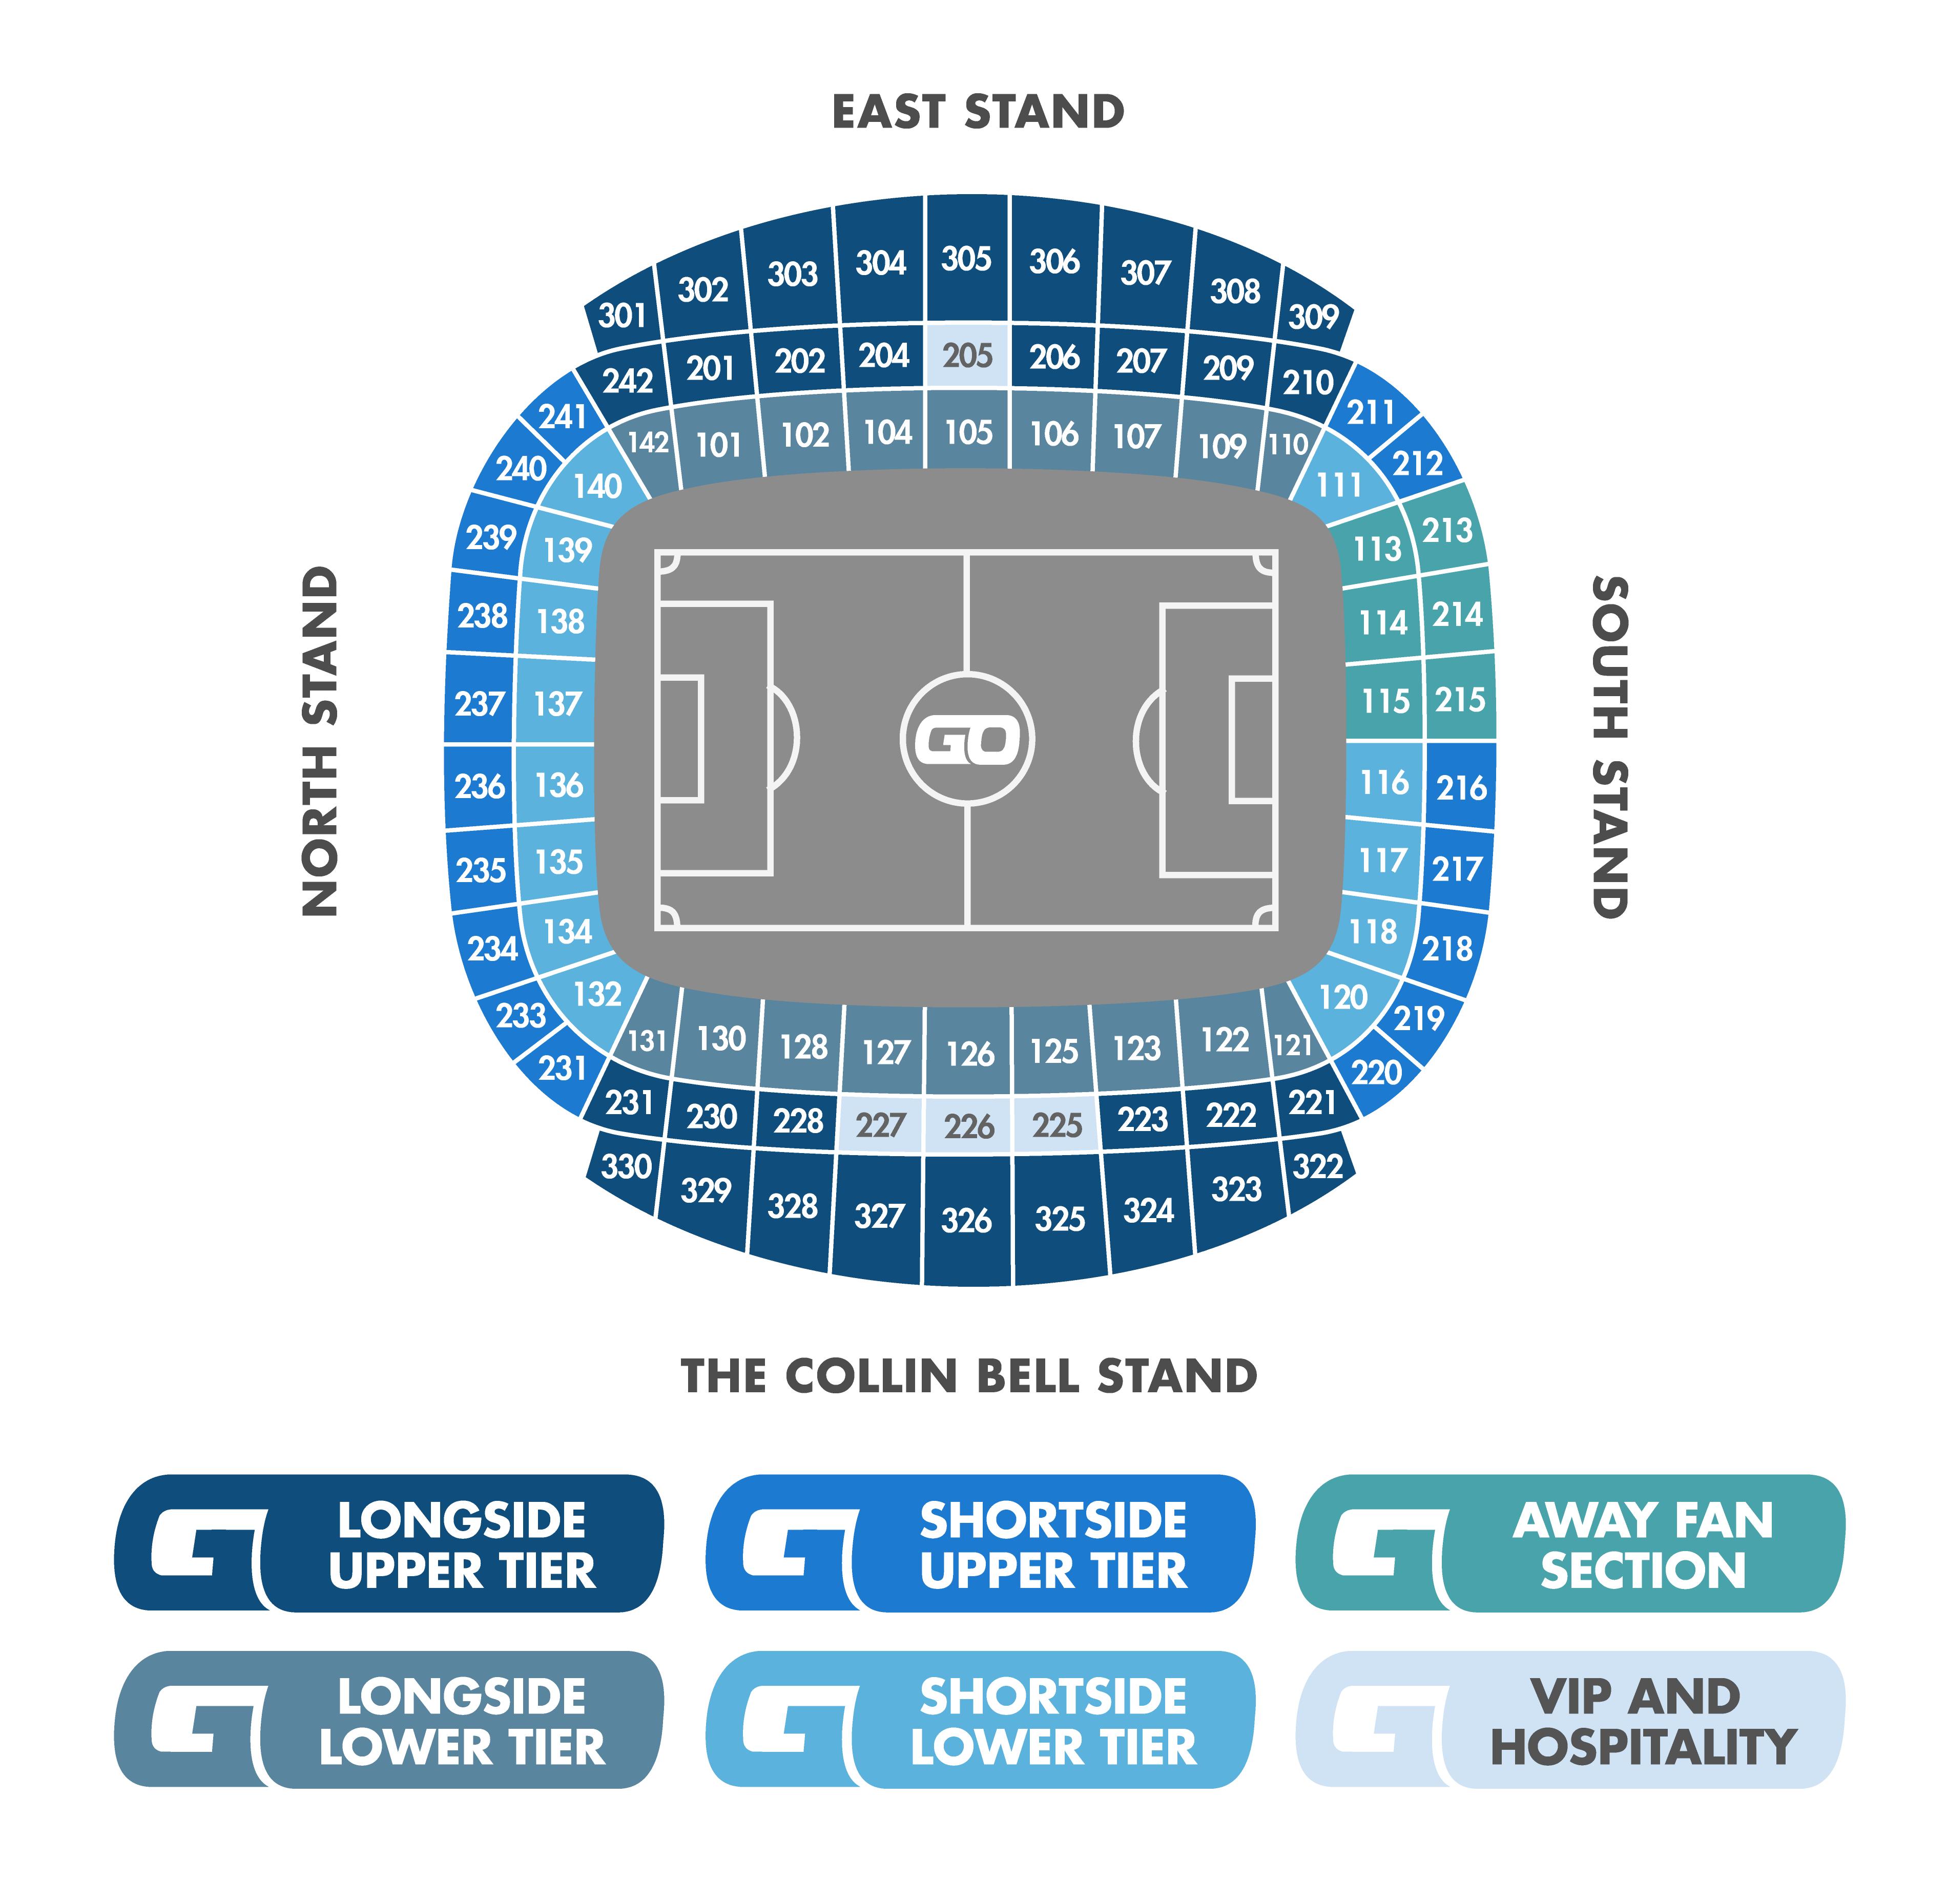 Manchester City Vs Leicester City Tickets 2017 18 Premier League Tickets At Etihad Stadium On Sat Feb 10 2018 20 00 Manchester City Premier League Tickets